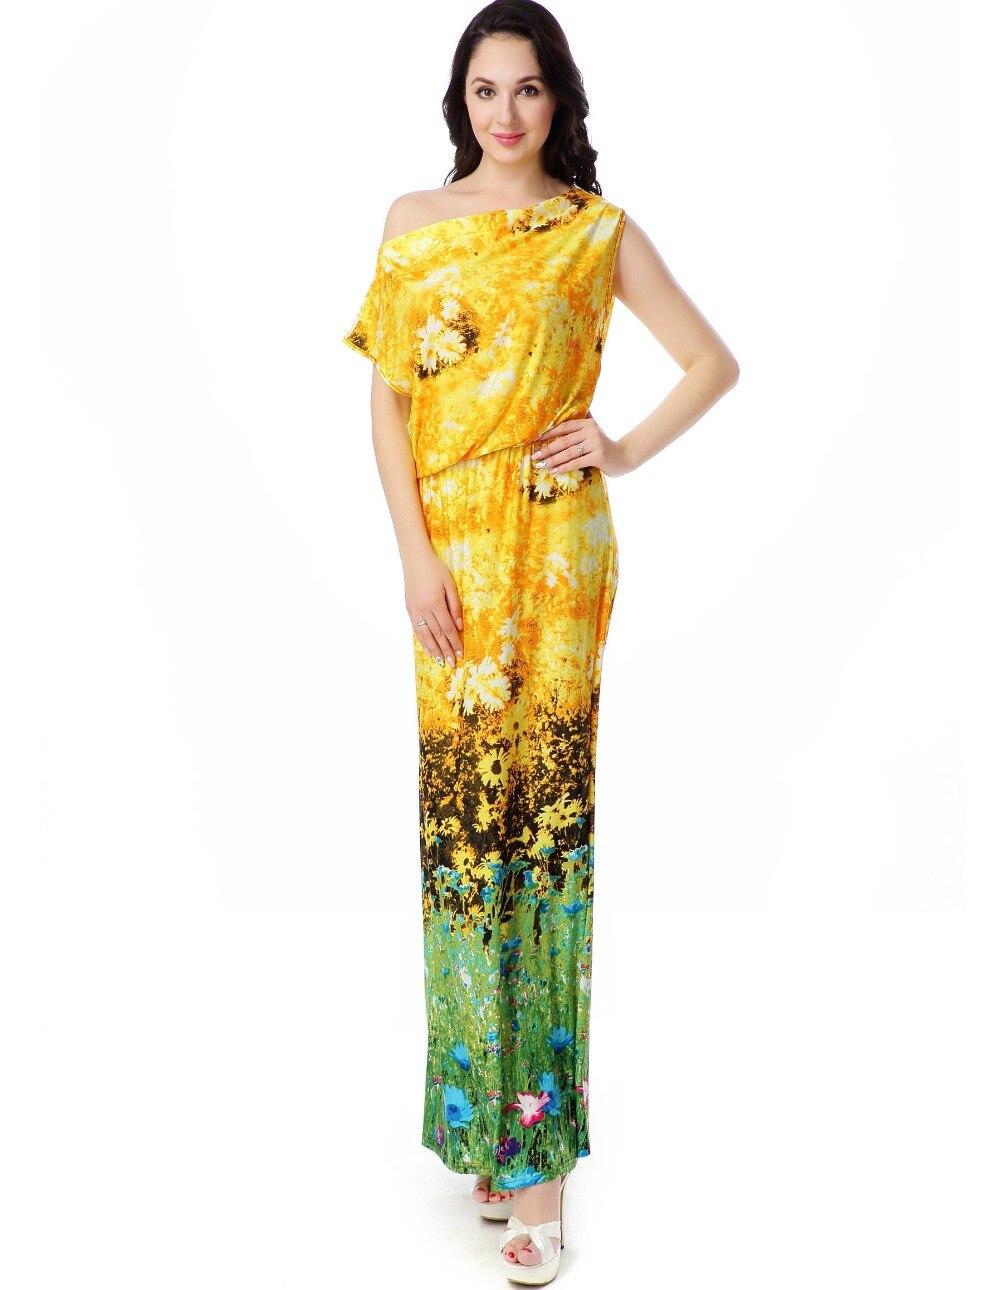 Women Summer Beach Dress Plus Size 6XL Printed Bohemian Dress Slash Neck Long Maxi Dress